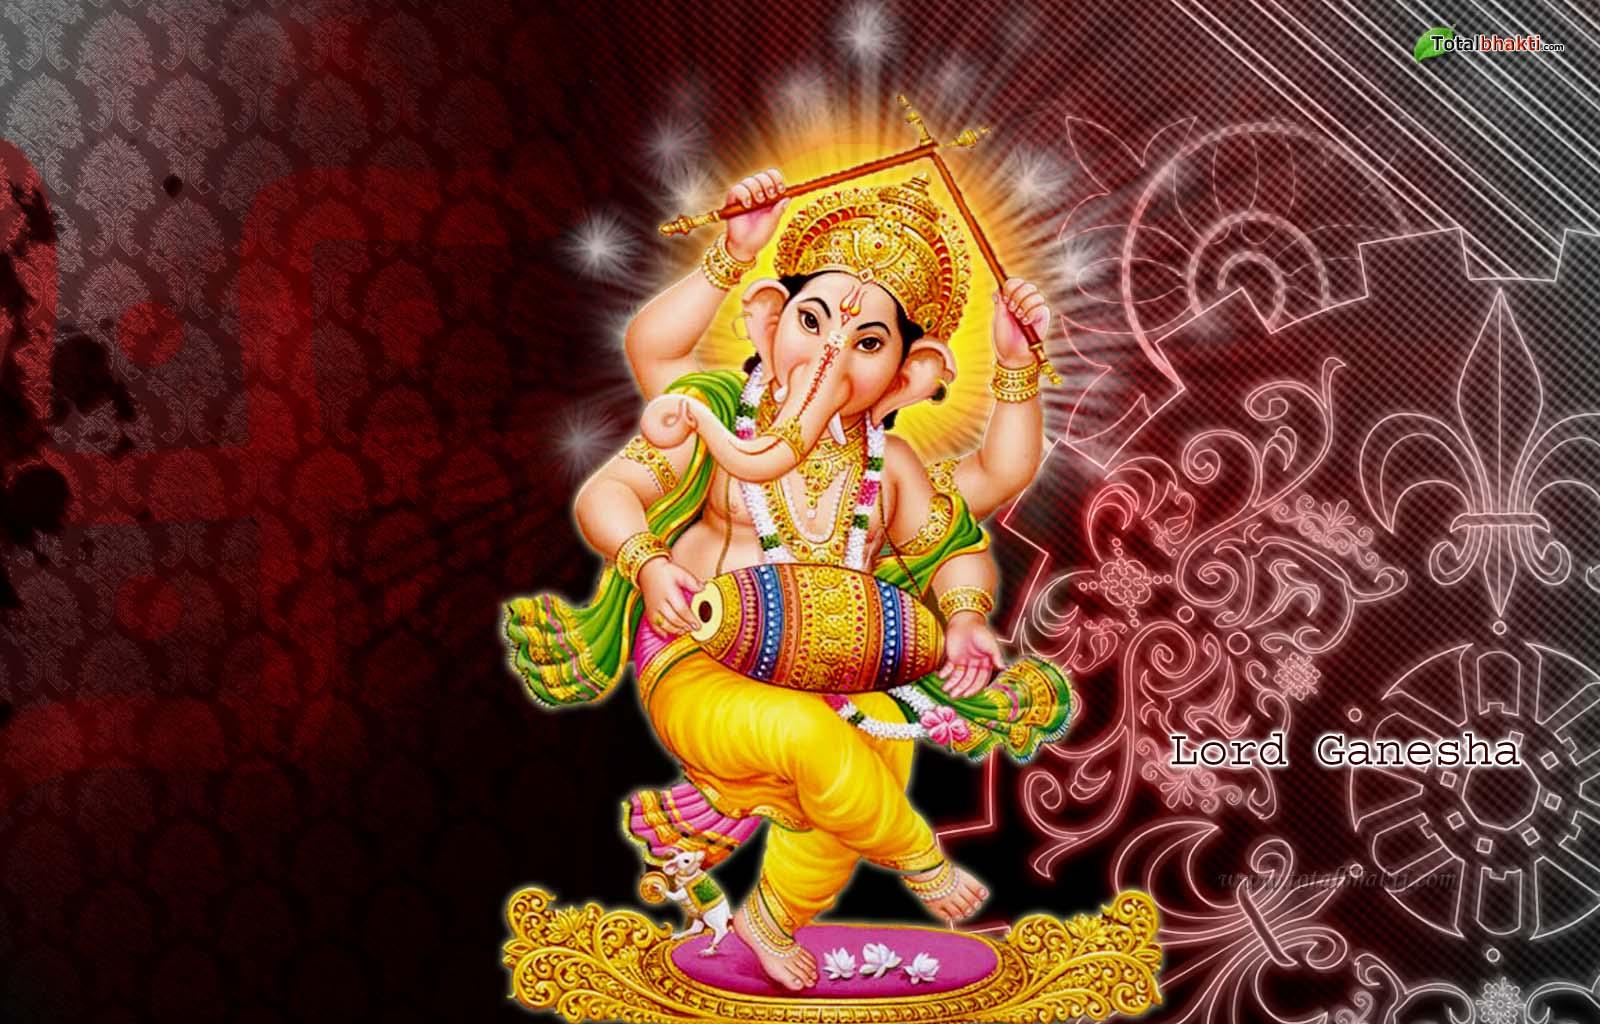 Download wallpaper gallery lord ganesha wallpaper 3 - Wallpaper 1600x1024 ...